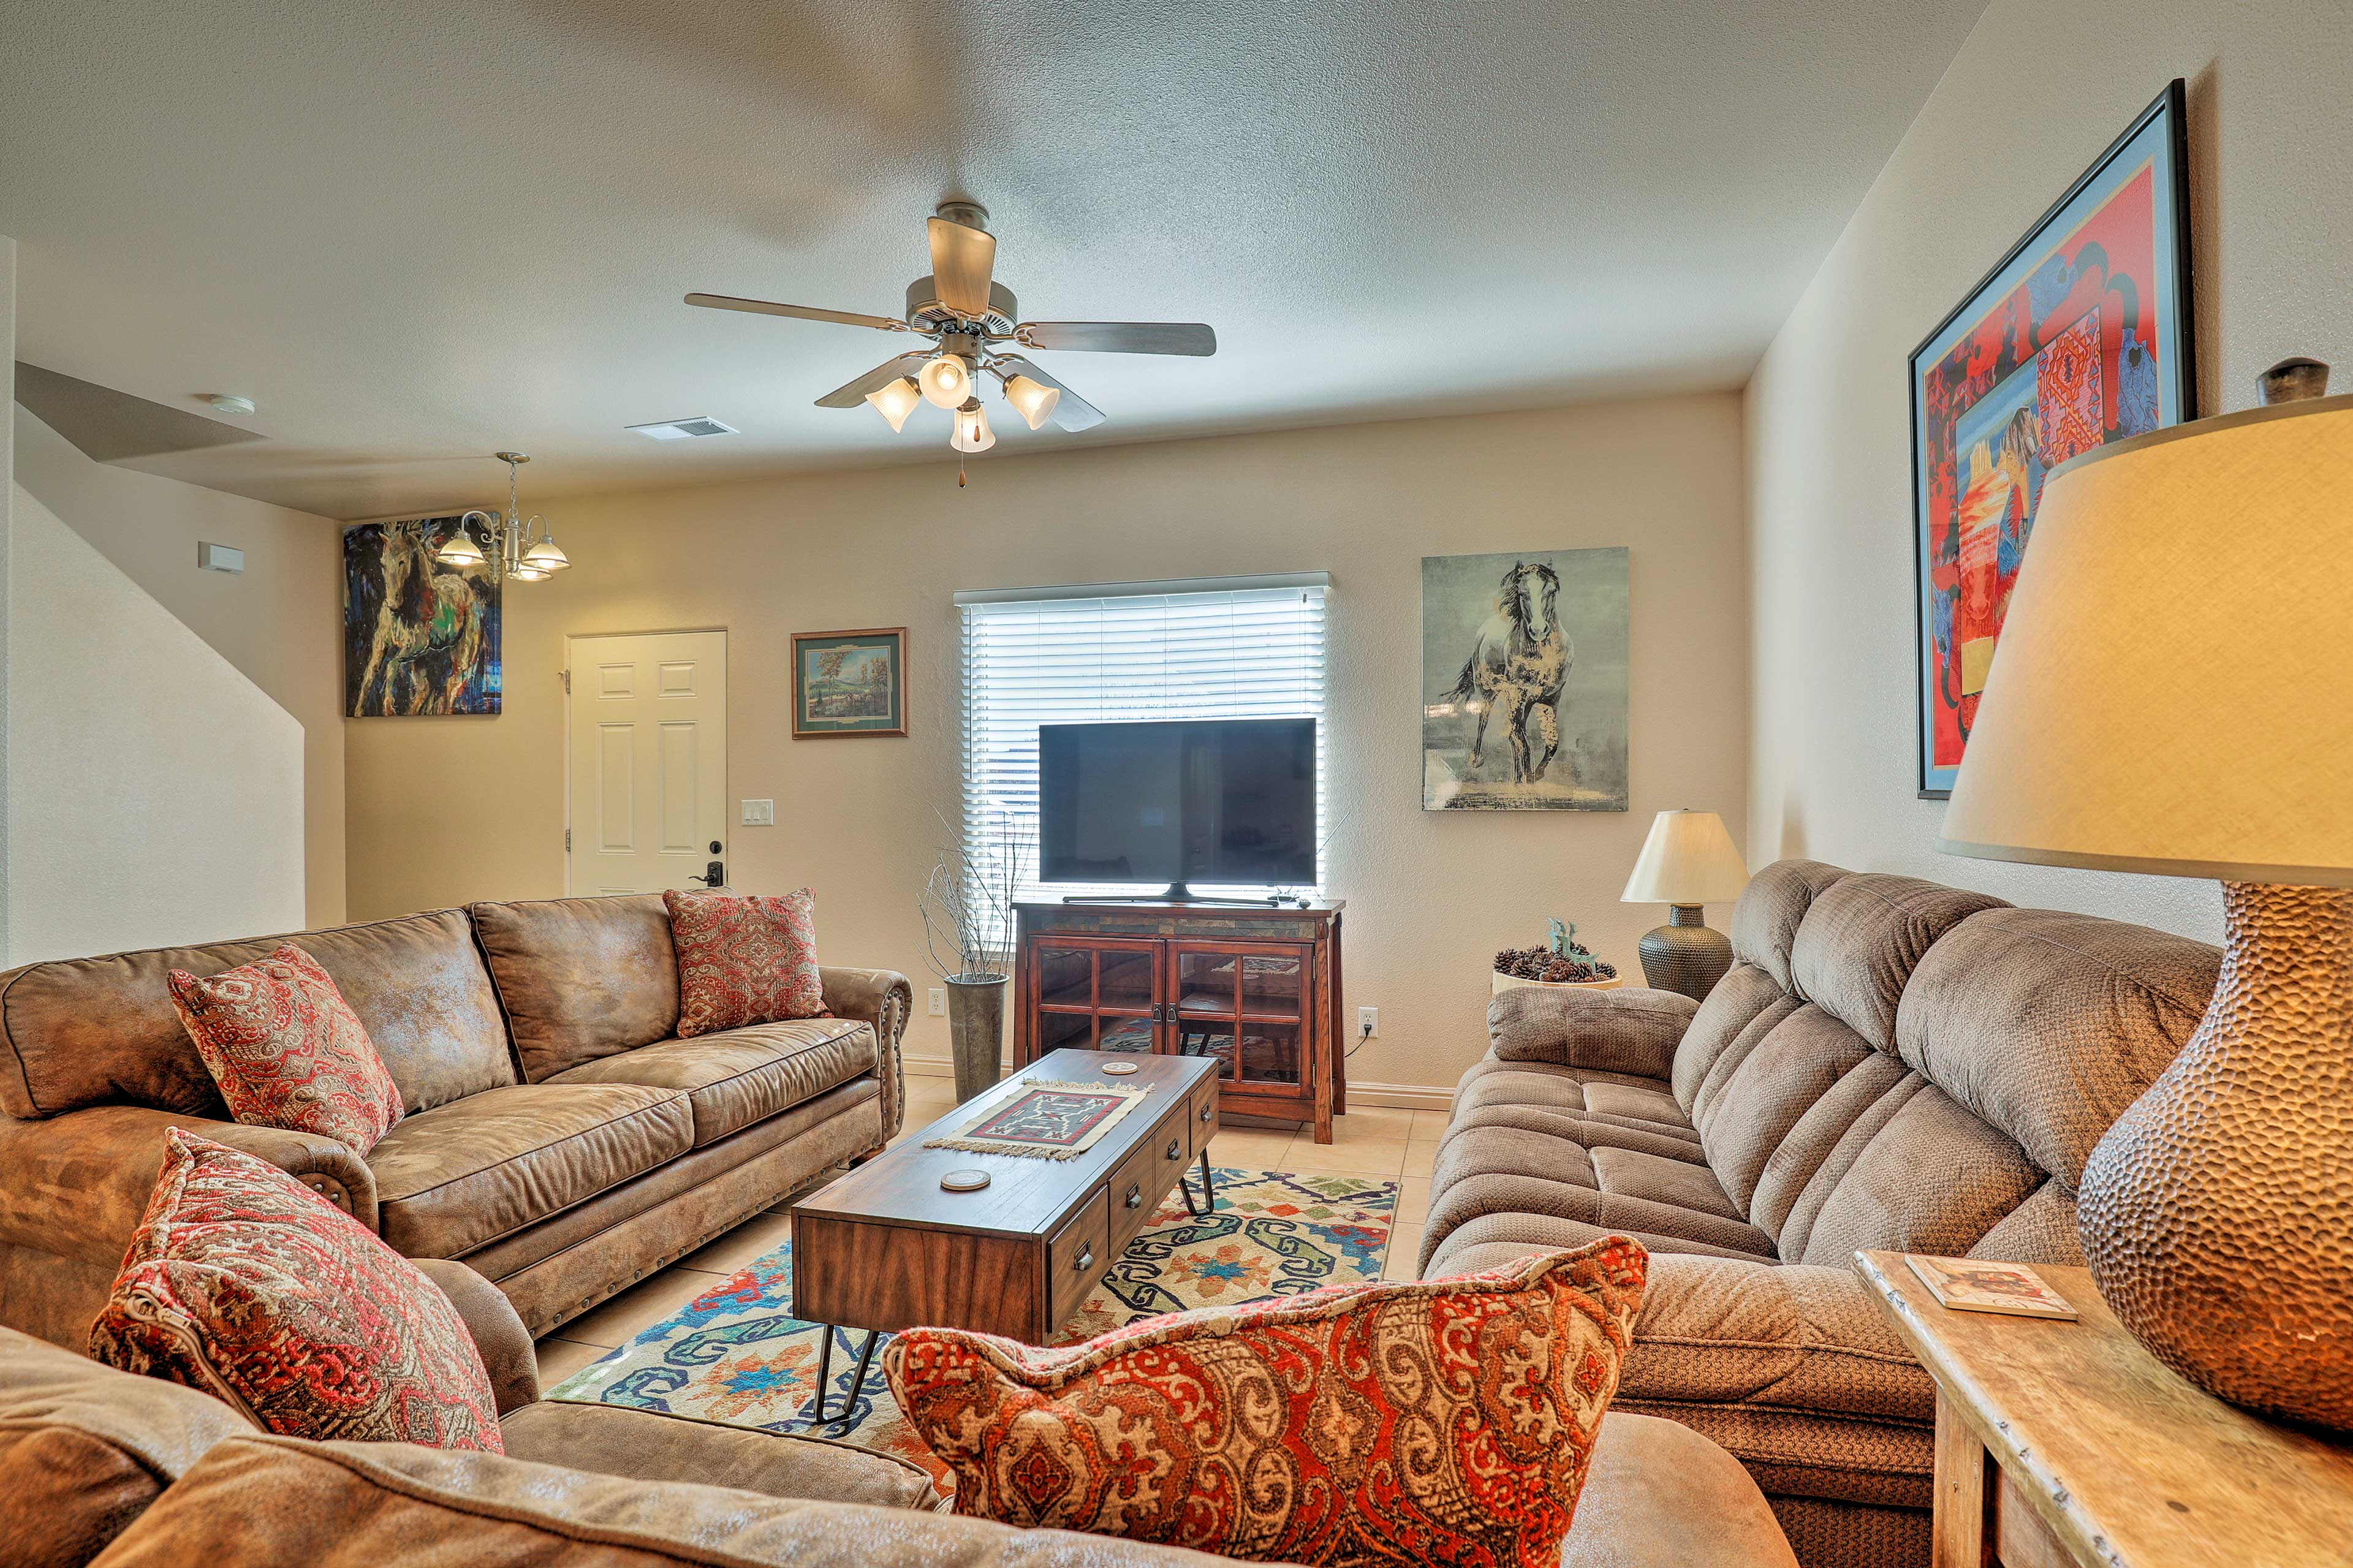 Make the most of your Utah getaway at this 3-BR, 1.5-BA vacation rental.